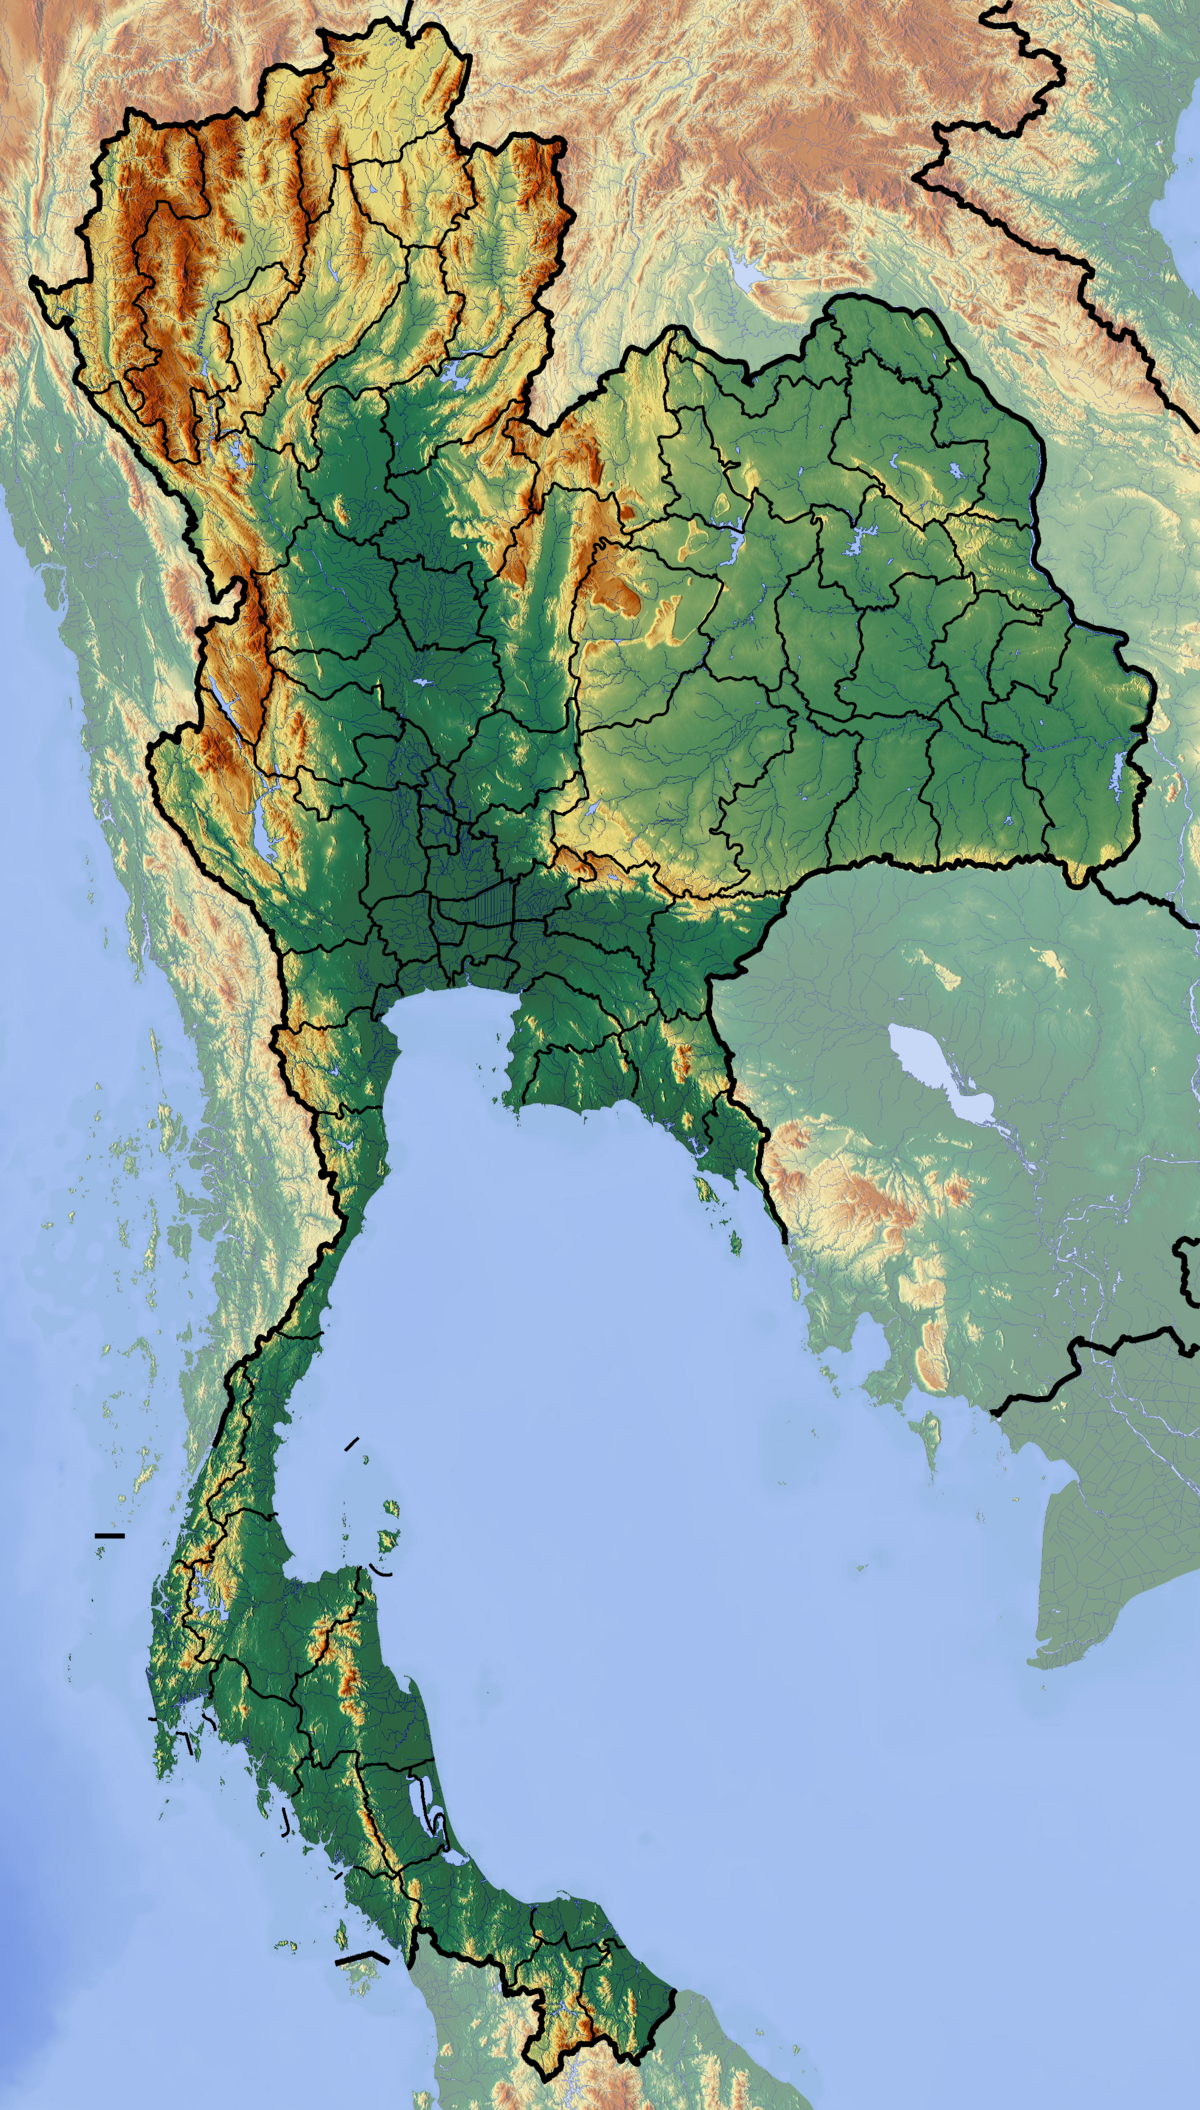 True Thailand Classic Wikipedia